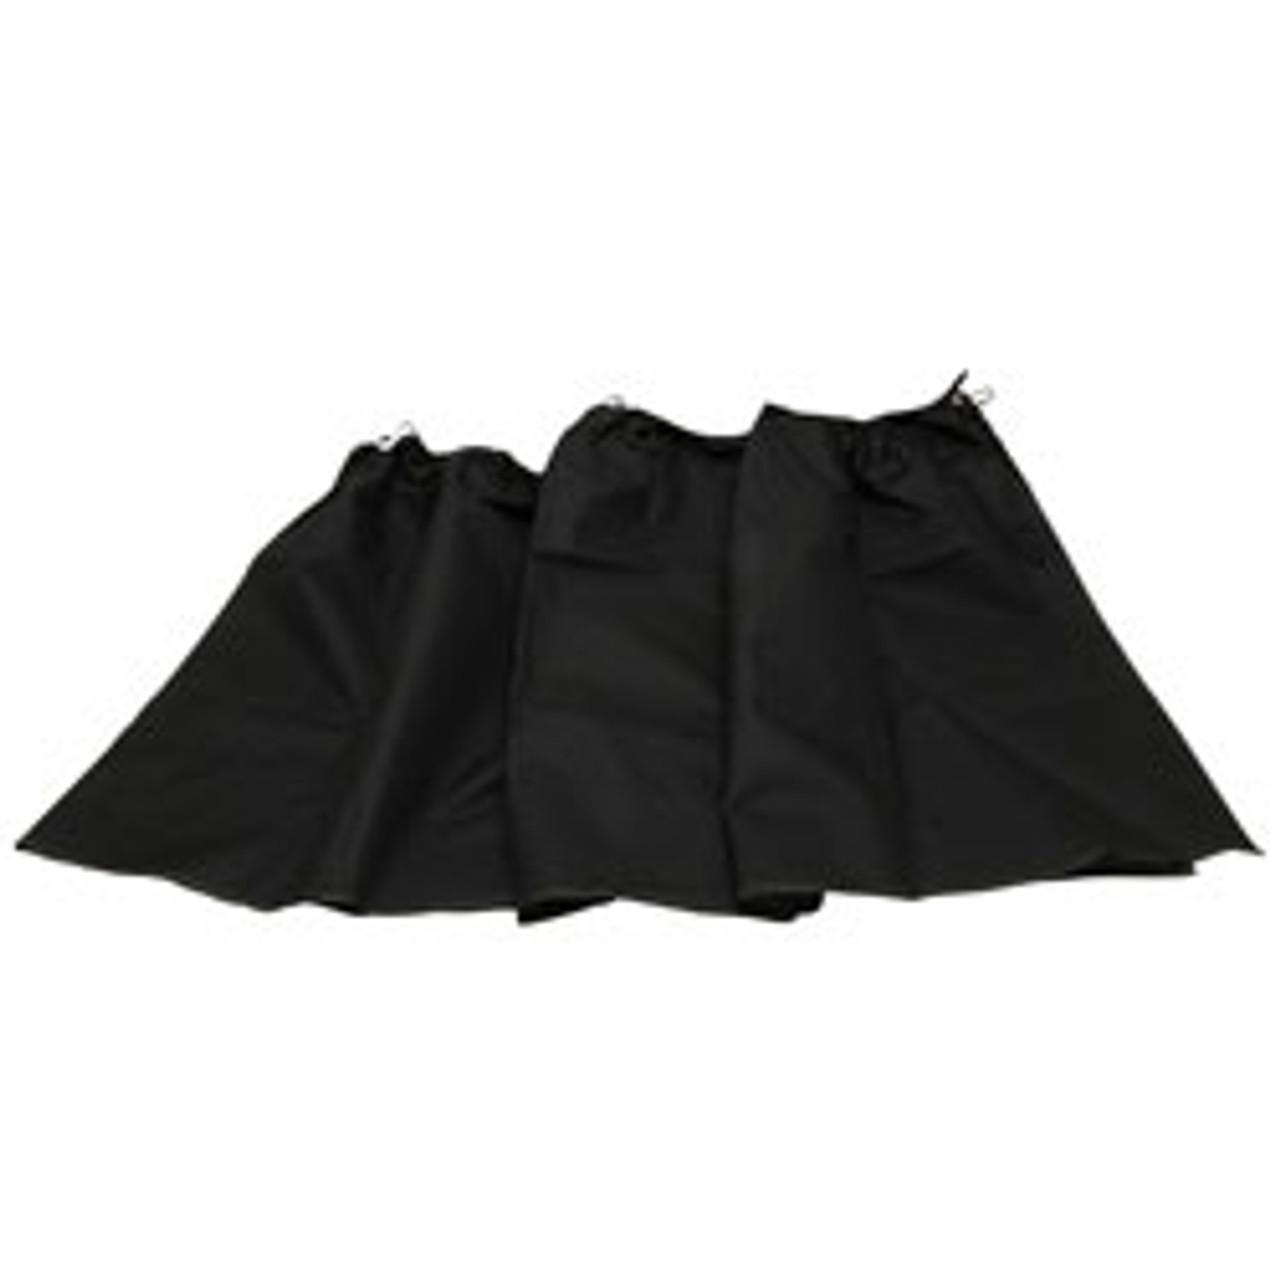 RoadPro(R) - Single Privacy Cab Curtain, Black